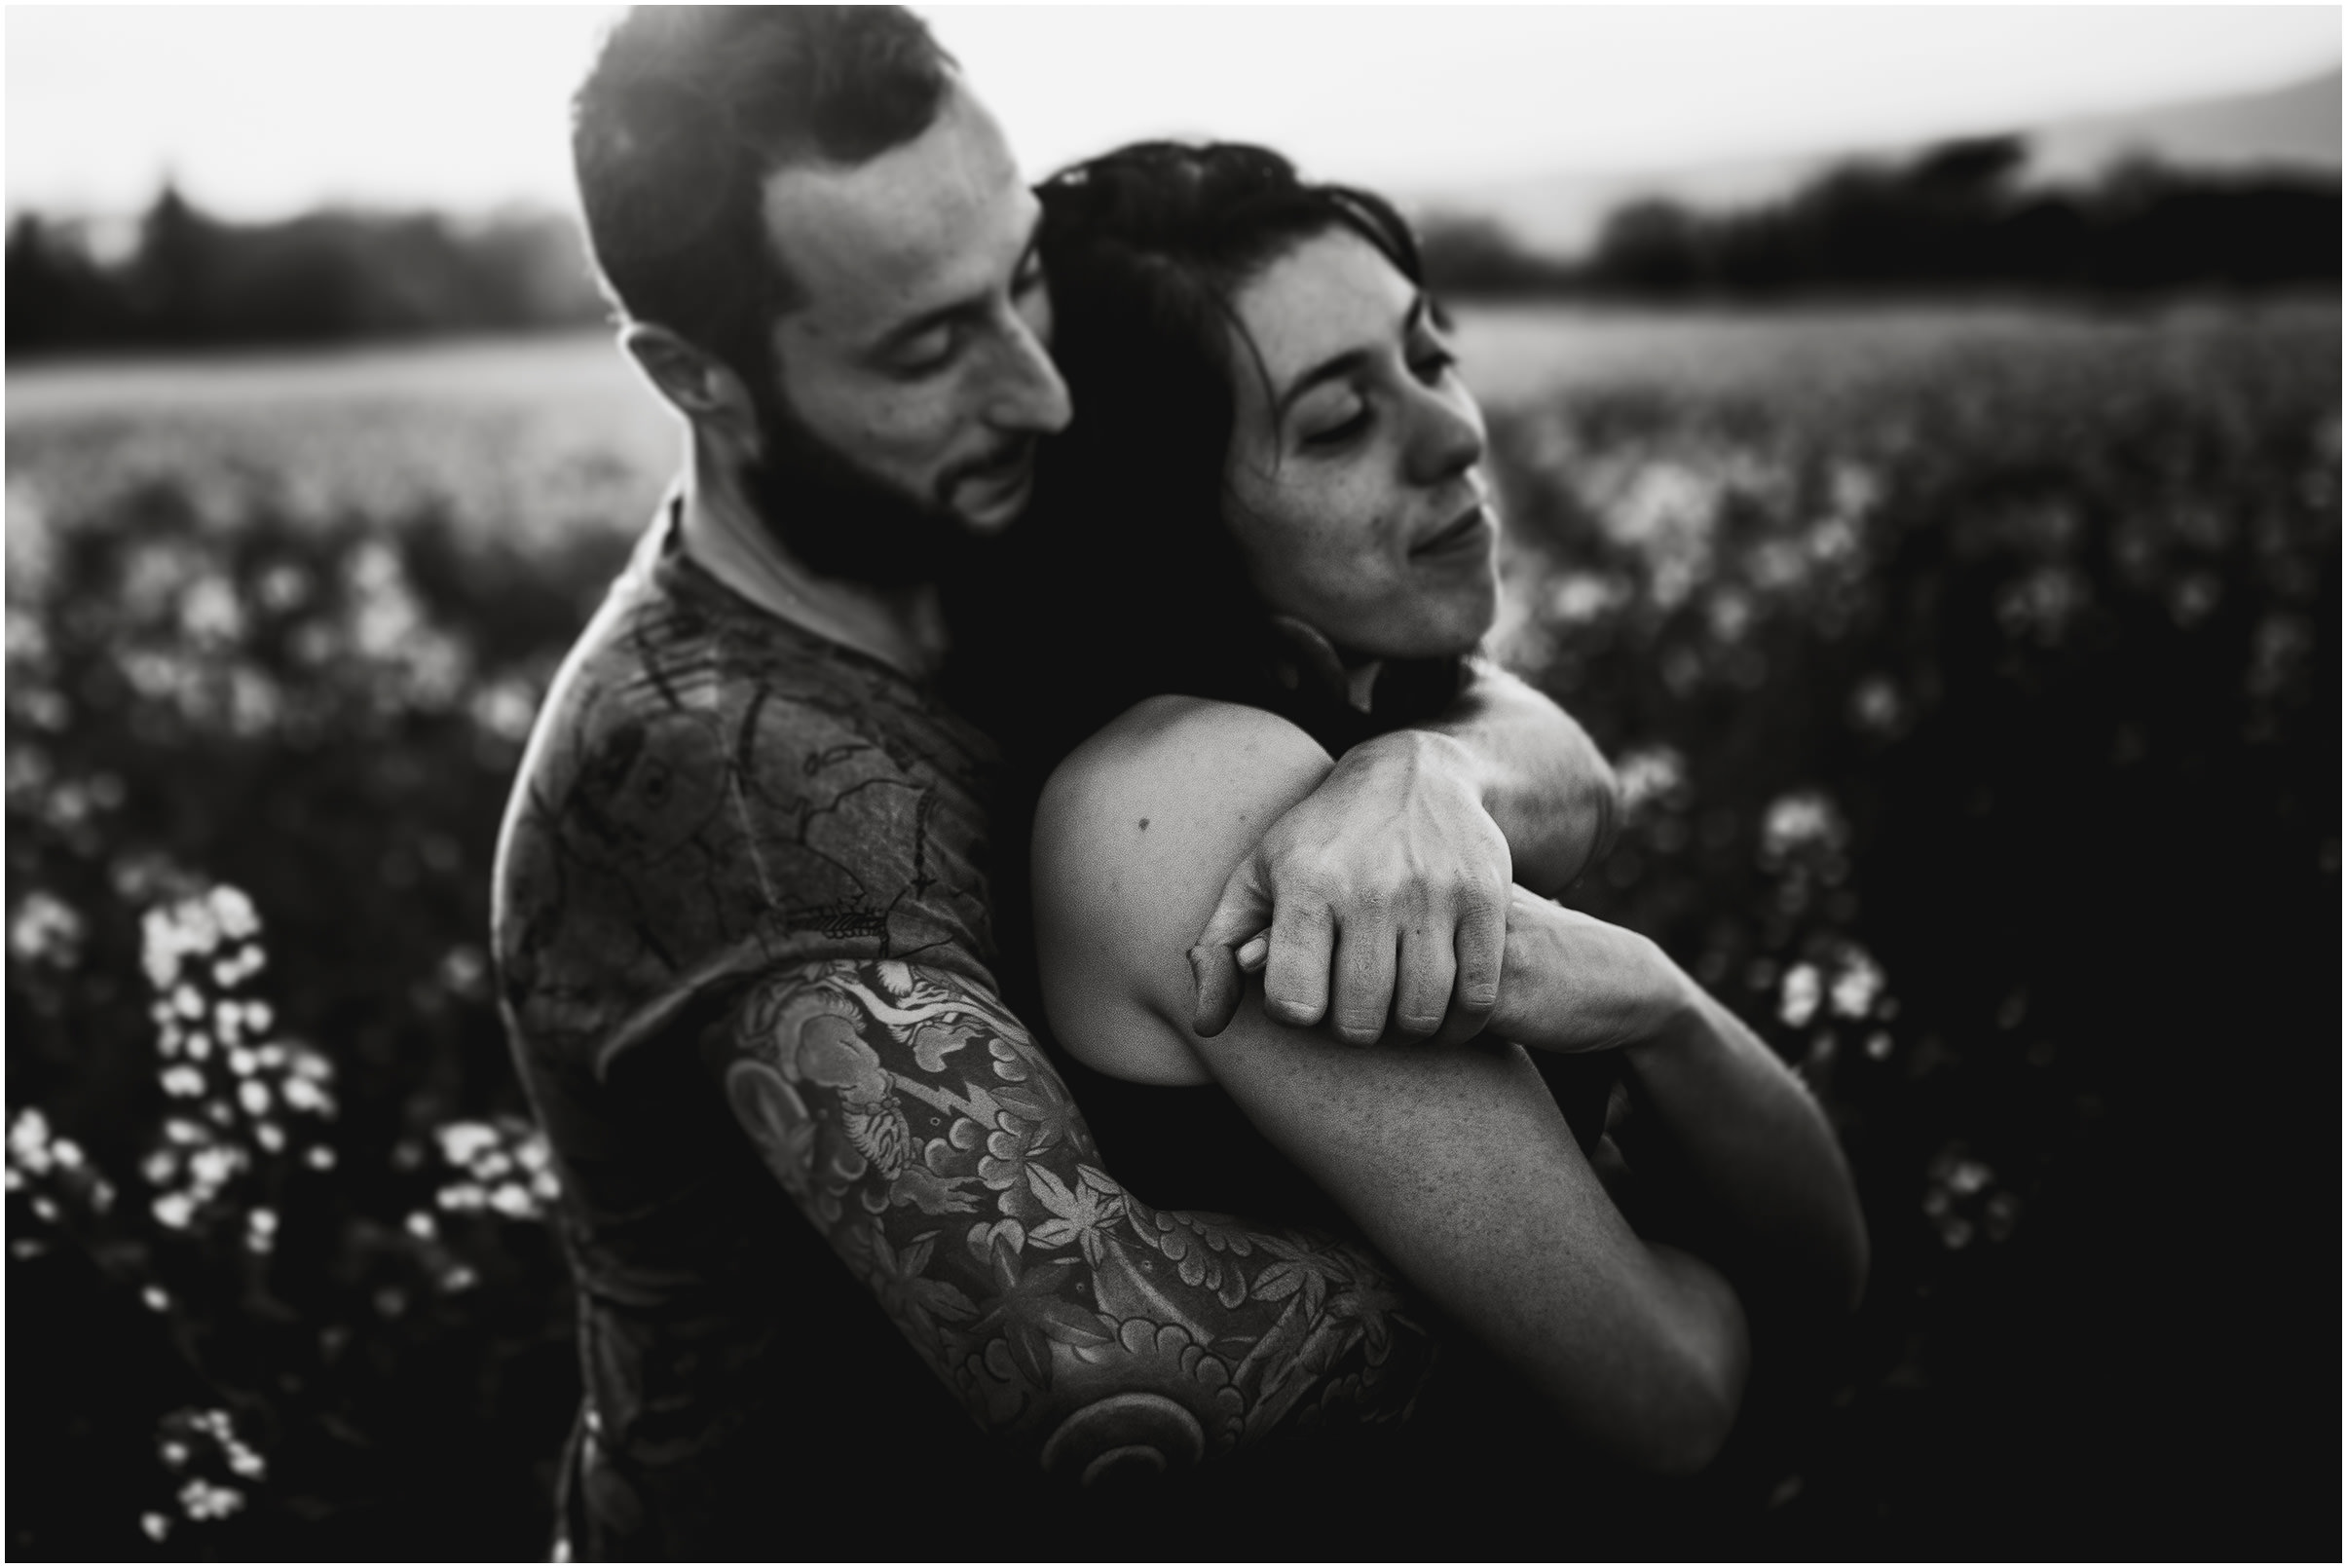 coppia-lovesession-marta-nicola-sara-lorenzoni-fotografia-wedding-matrimonio-arezzo-19